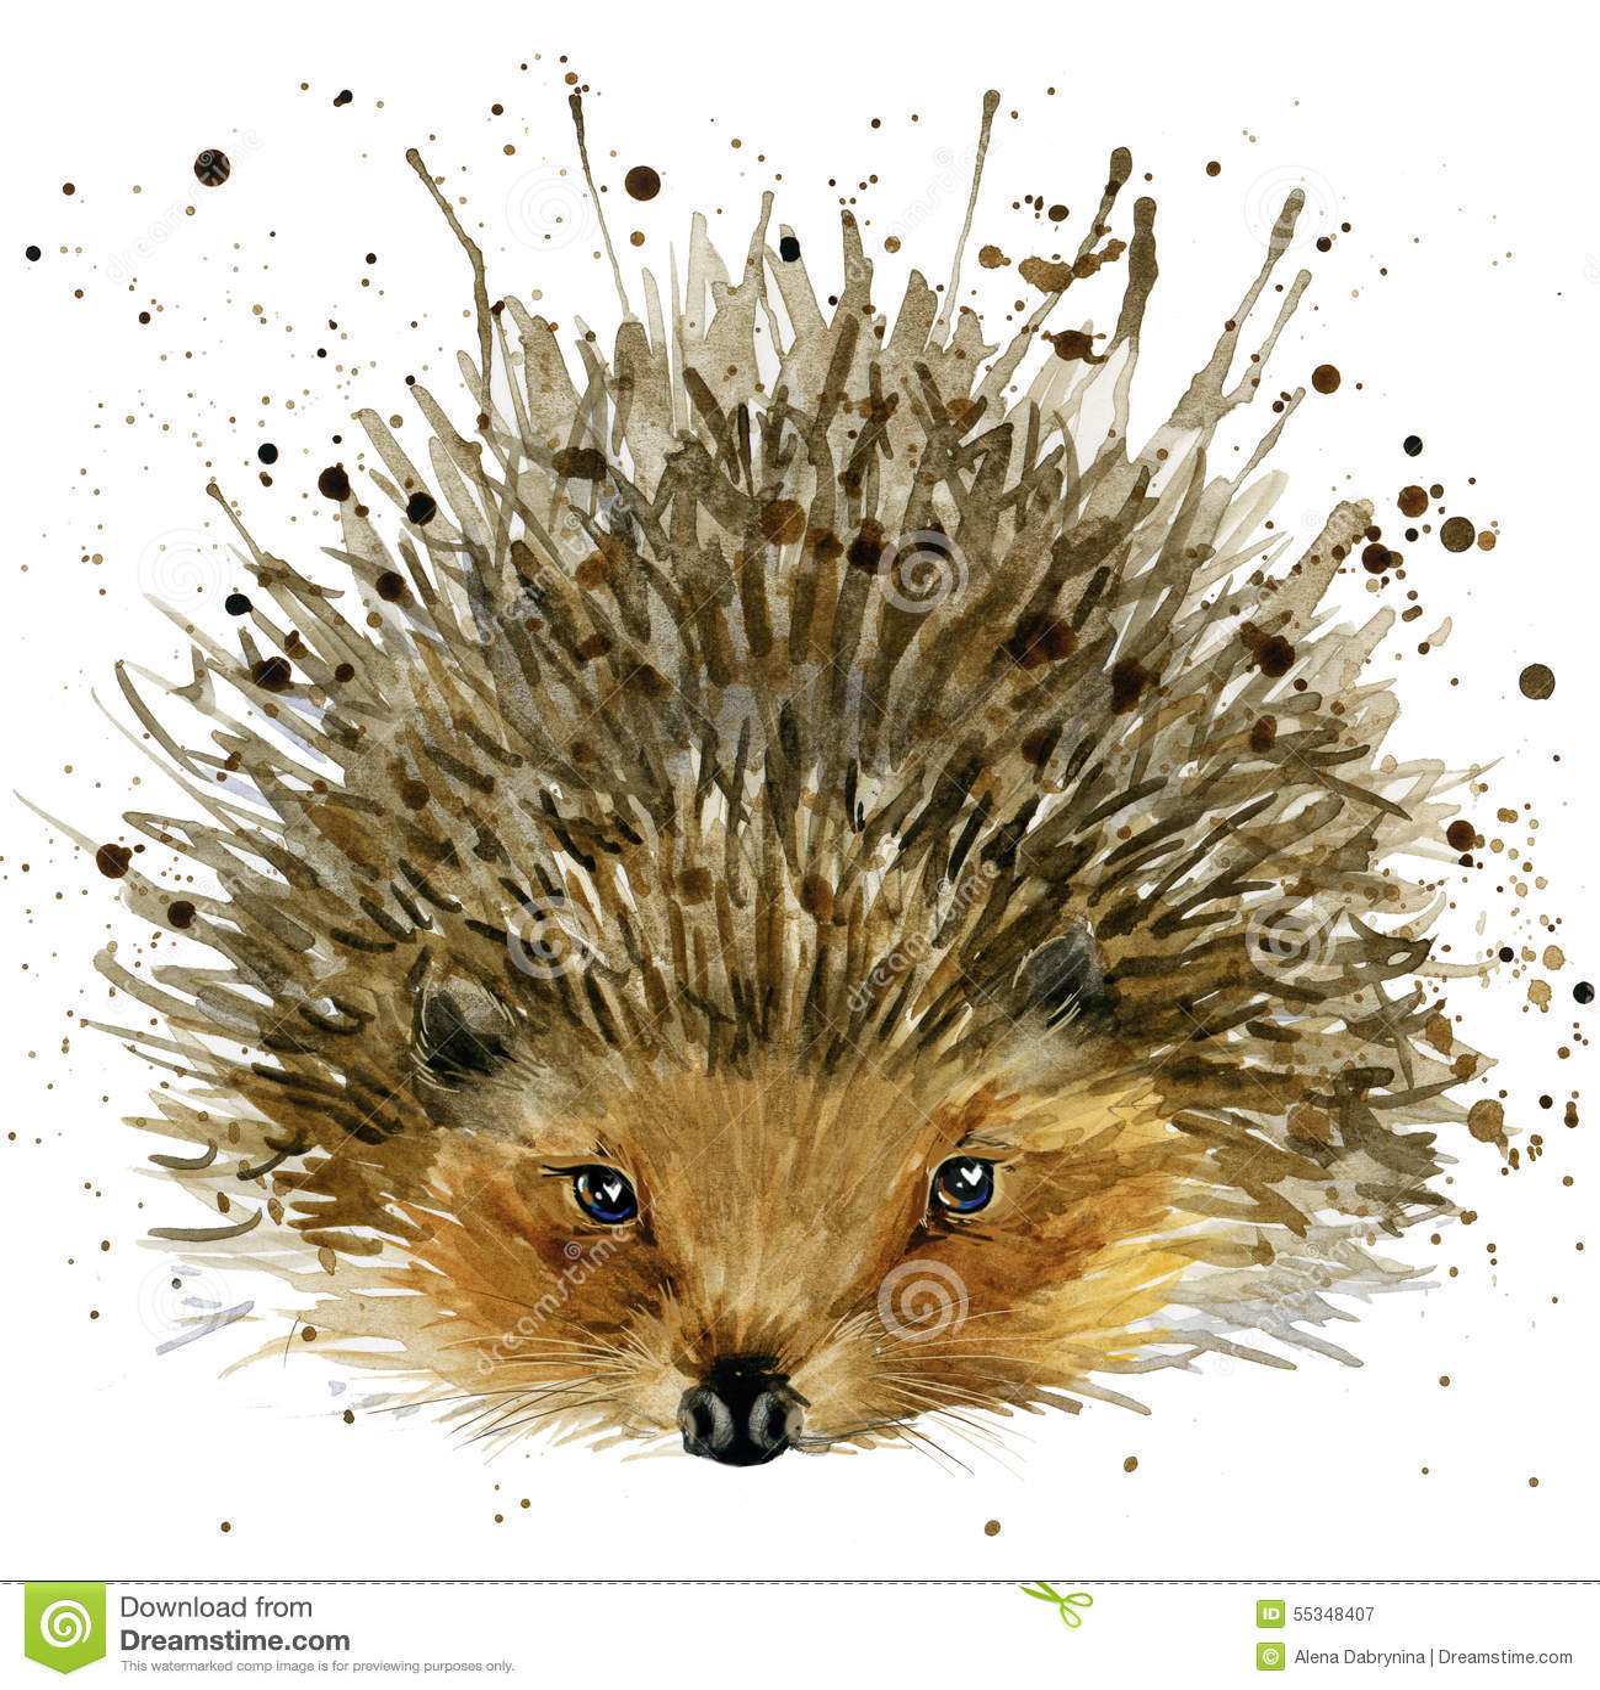 Hedgehog illustration with splash watercolor textured background